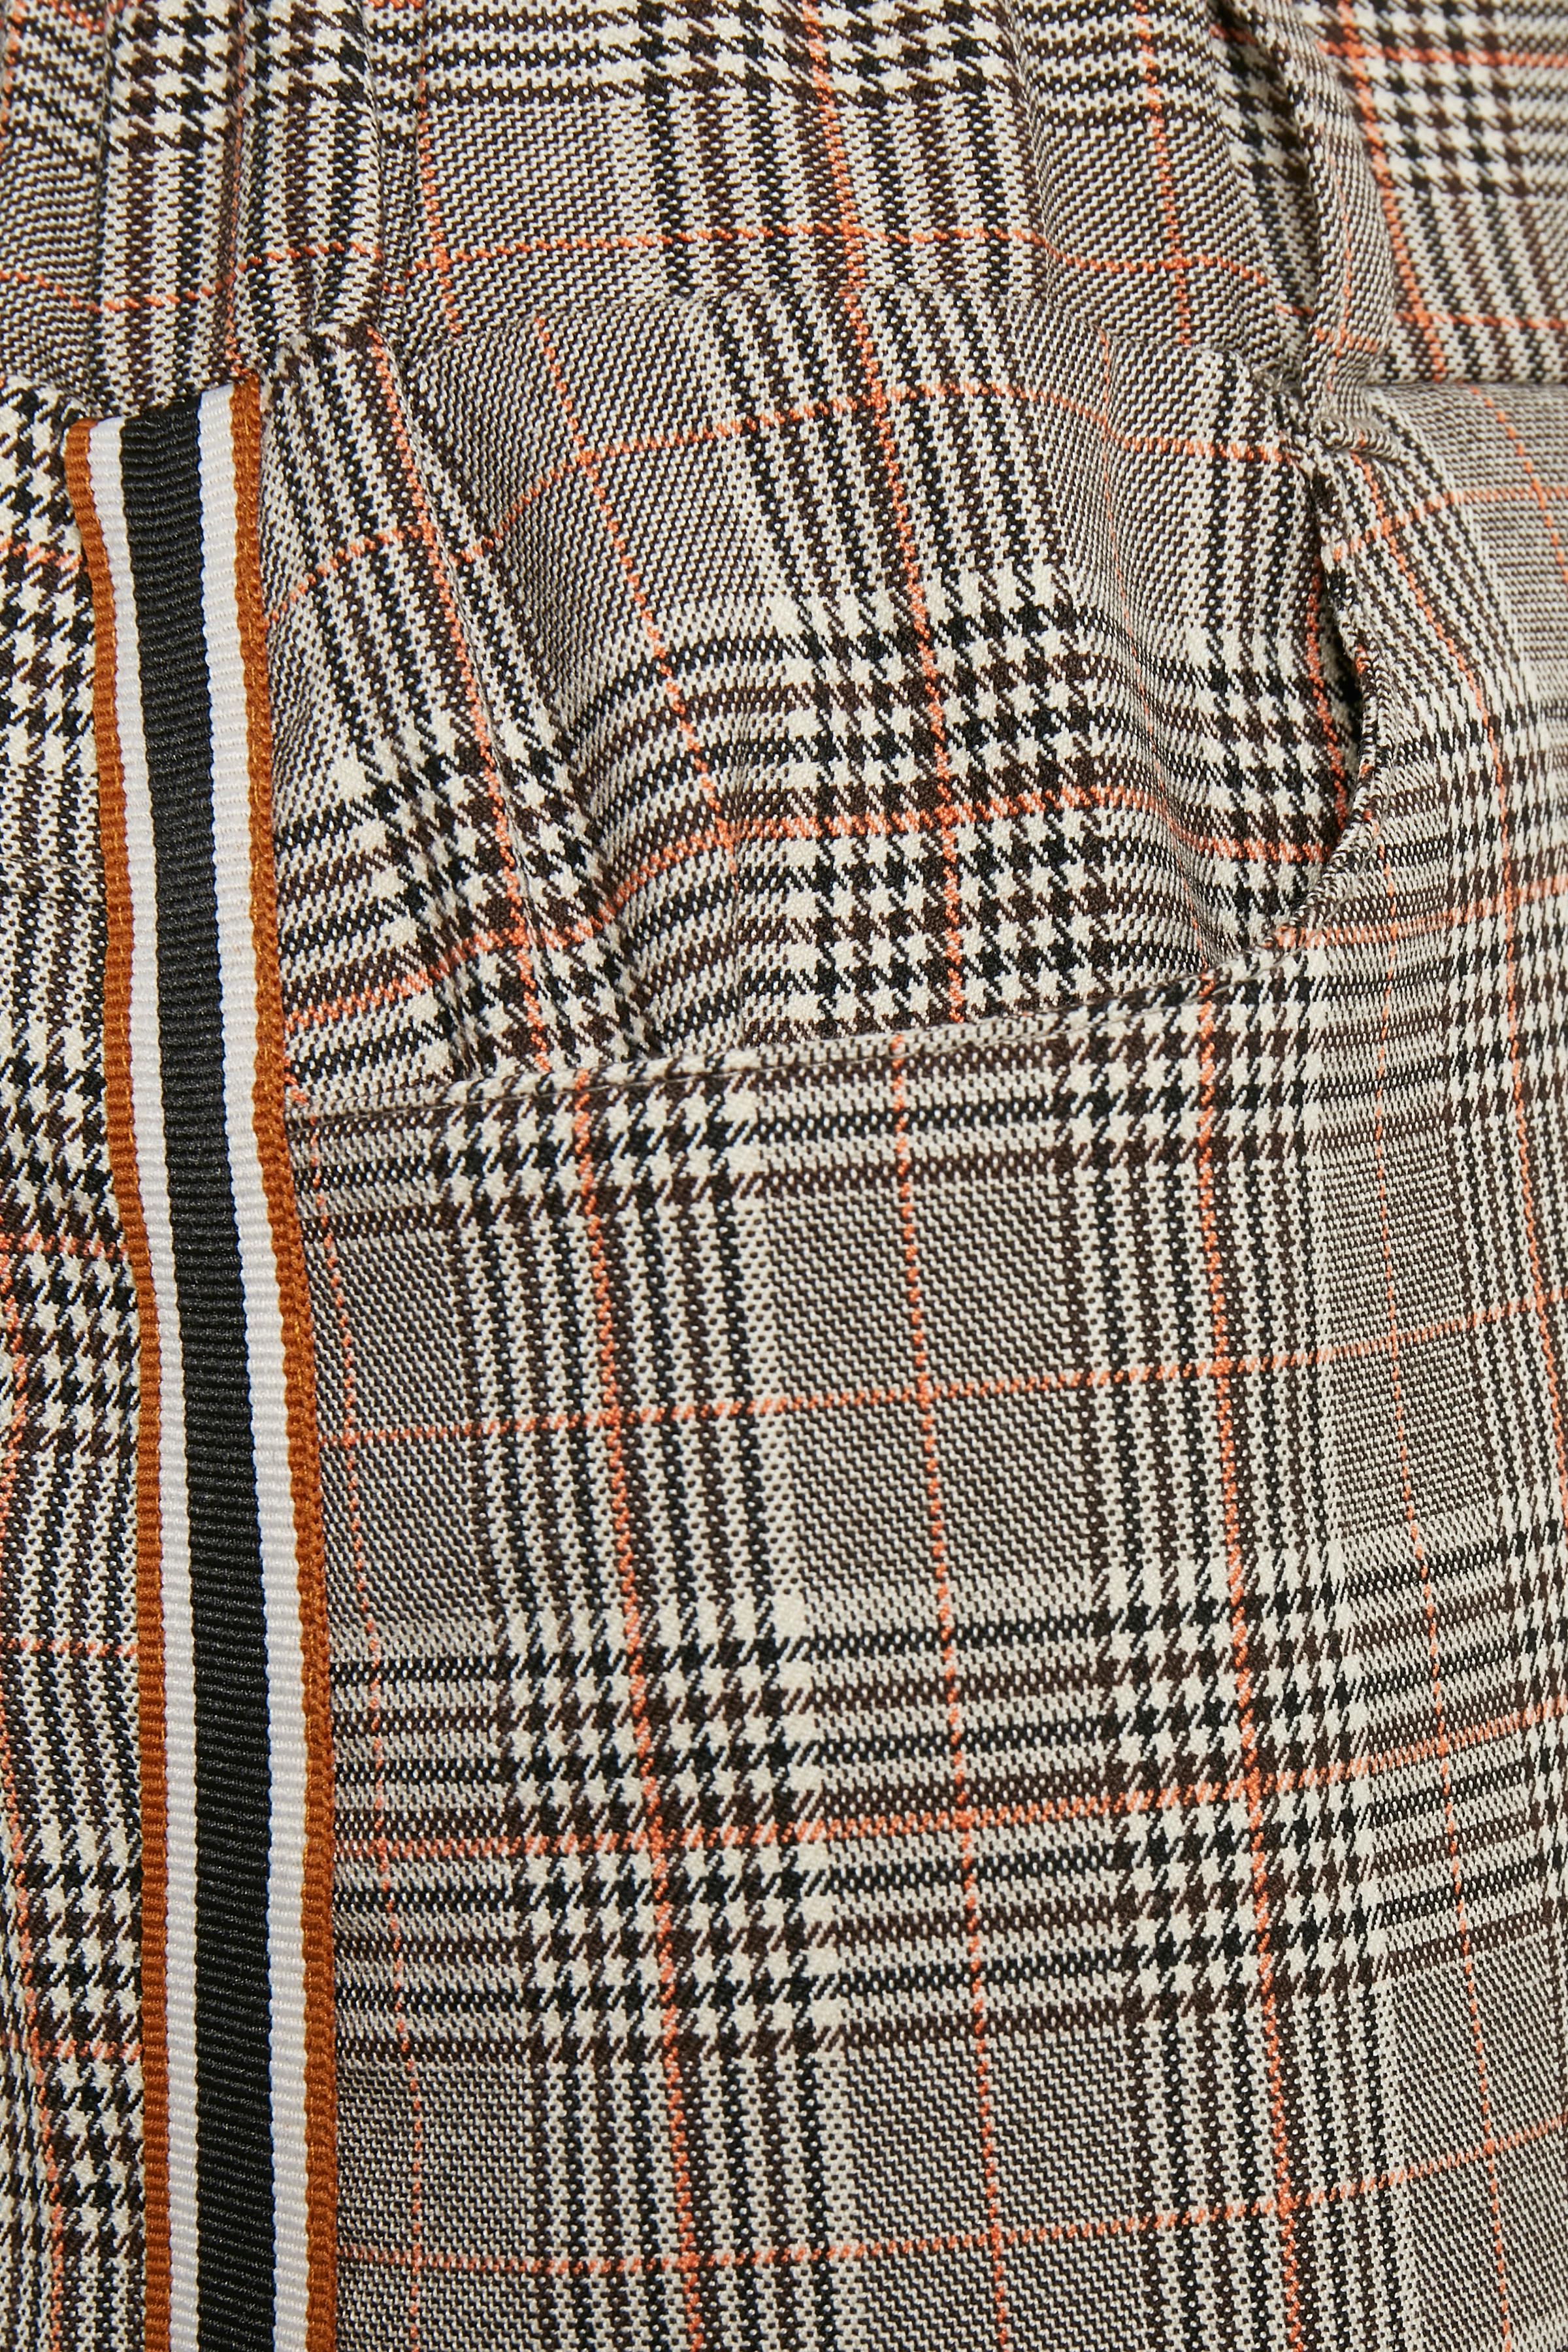 Mørkebrun/off-white Nederdele fra Kaffe – Køb Mørkebrun/off-white Nederdele fra str. 32-46 her